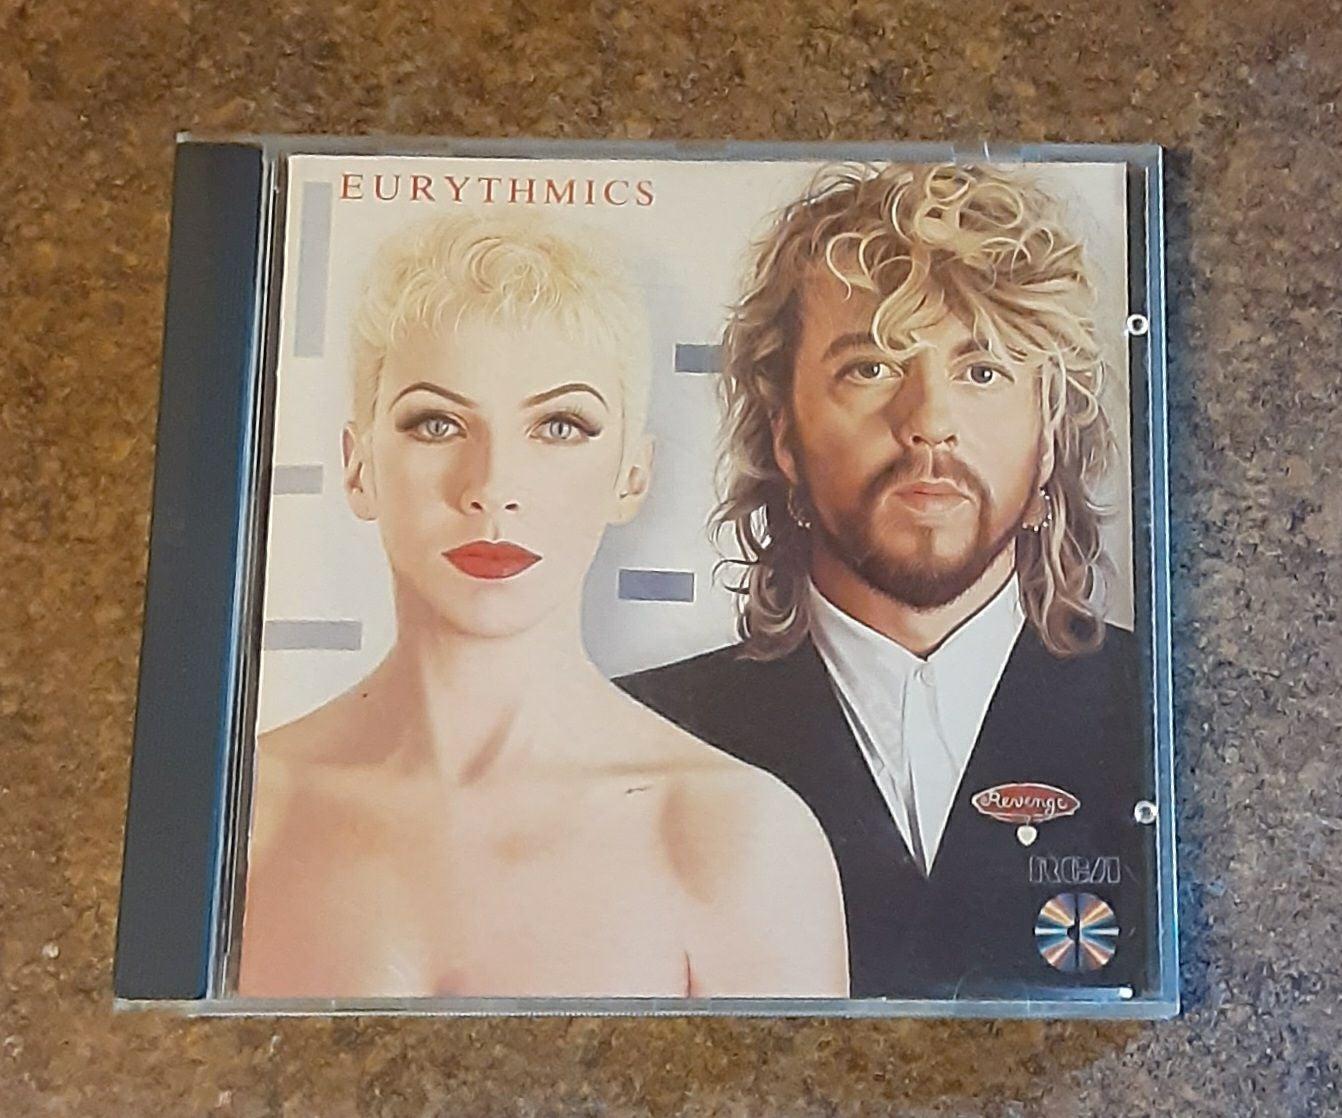 "Eurythmics ""Revenge"" Compact Disc Music"